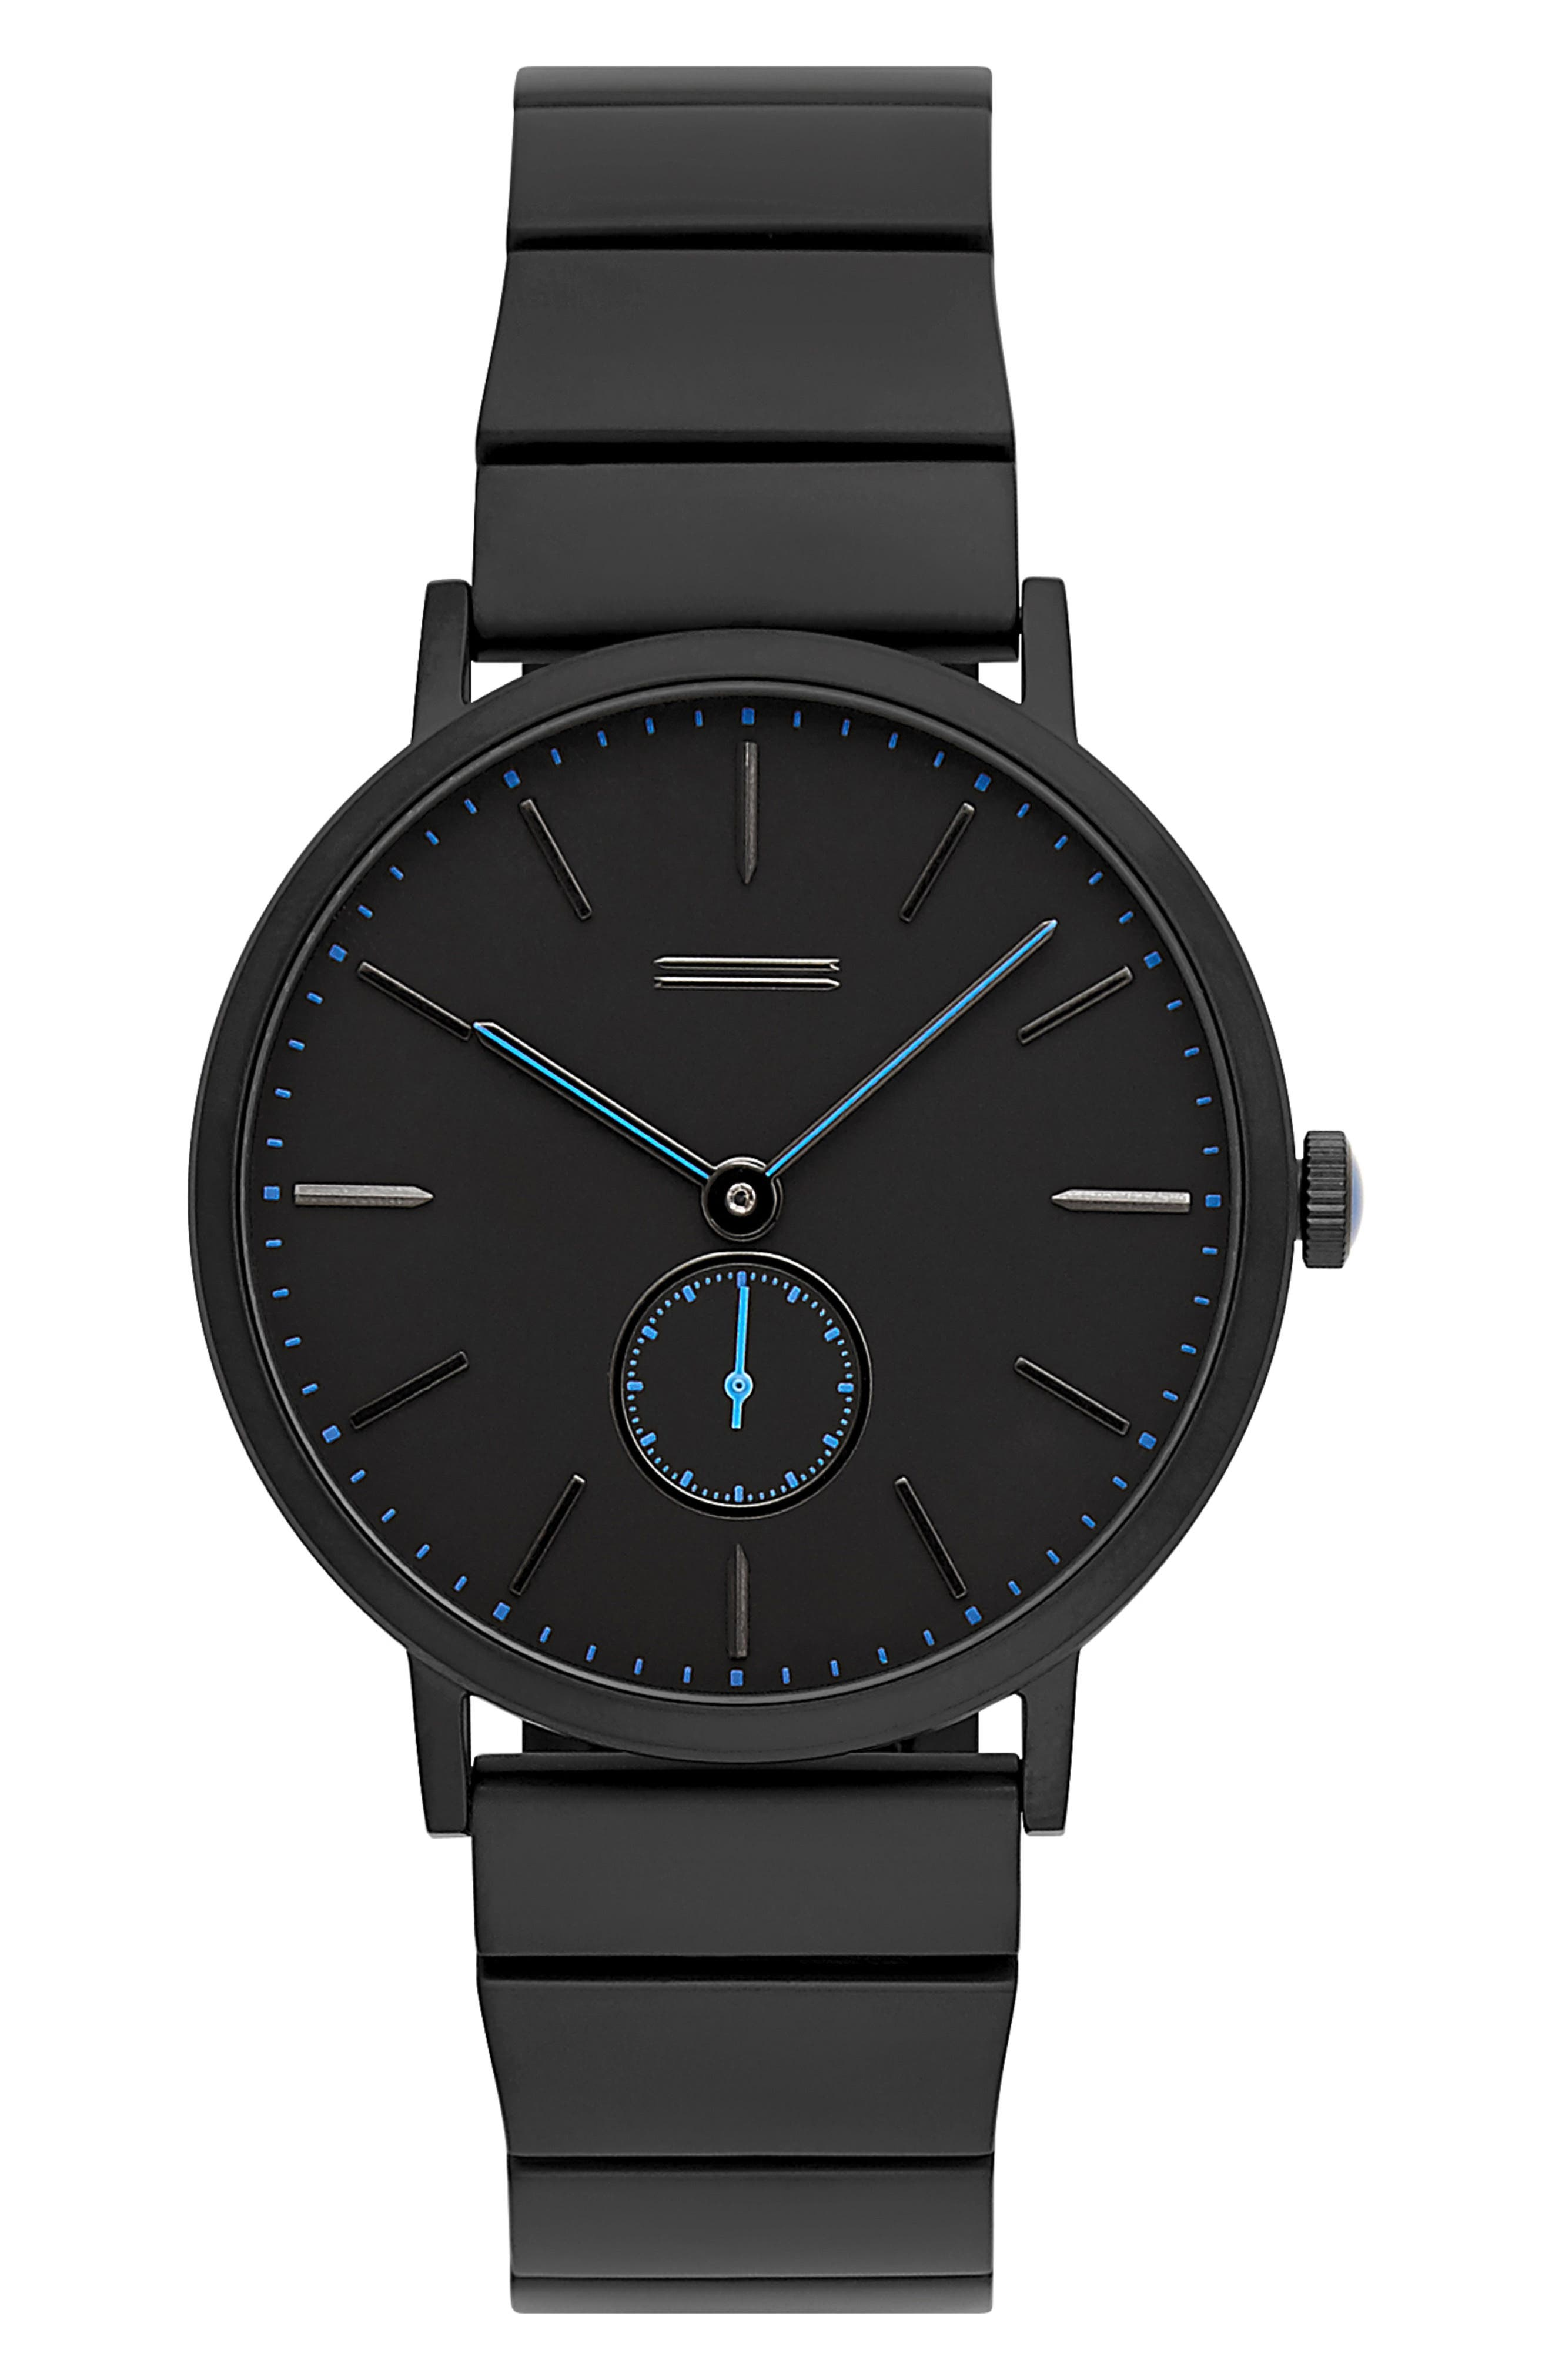 URI MINKOFF Norrebro Bracelet Watch, 40Mm in Black